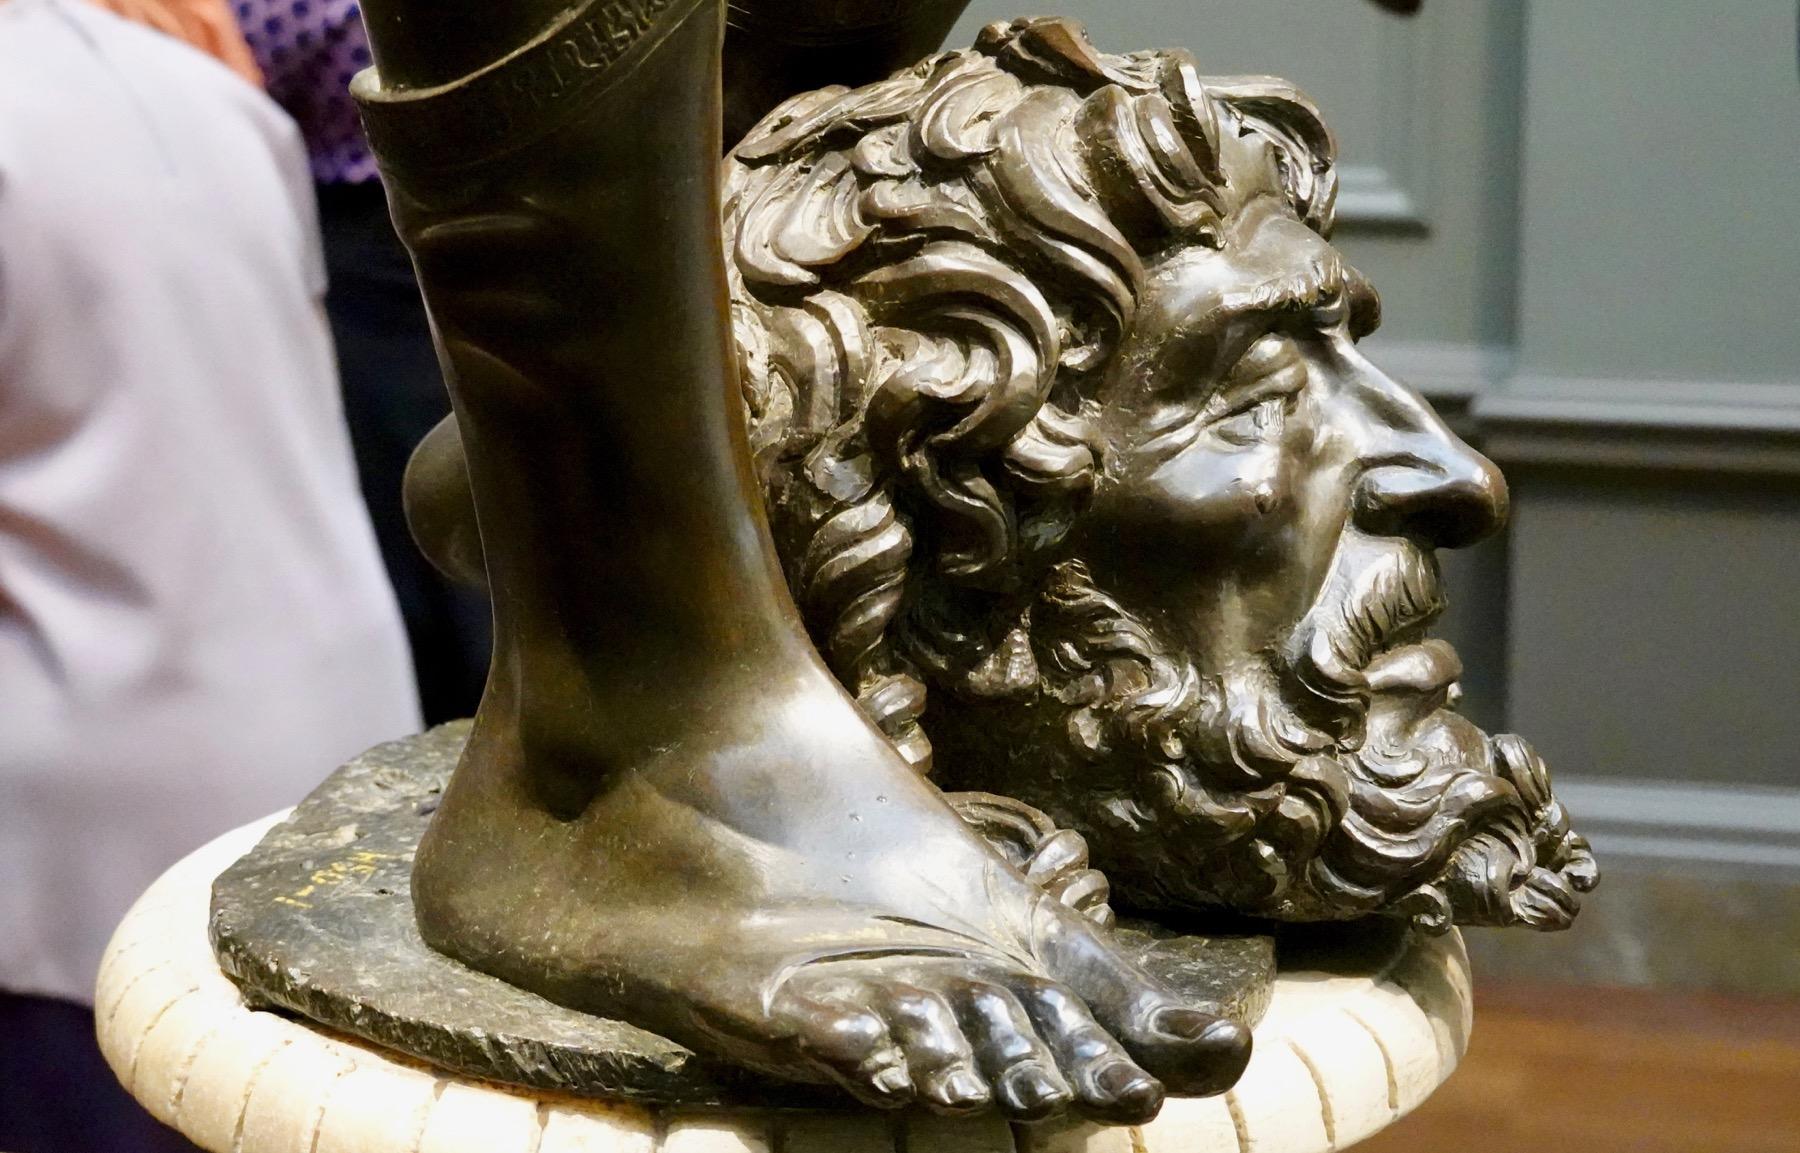 Davids foot Goliaths head